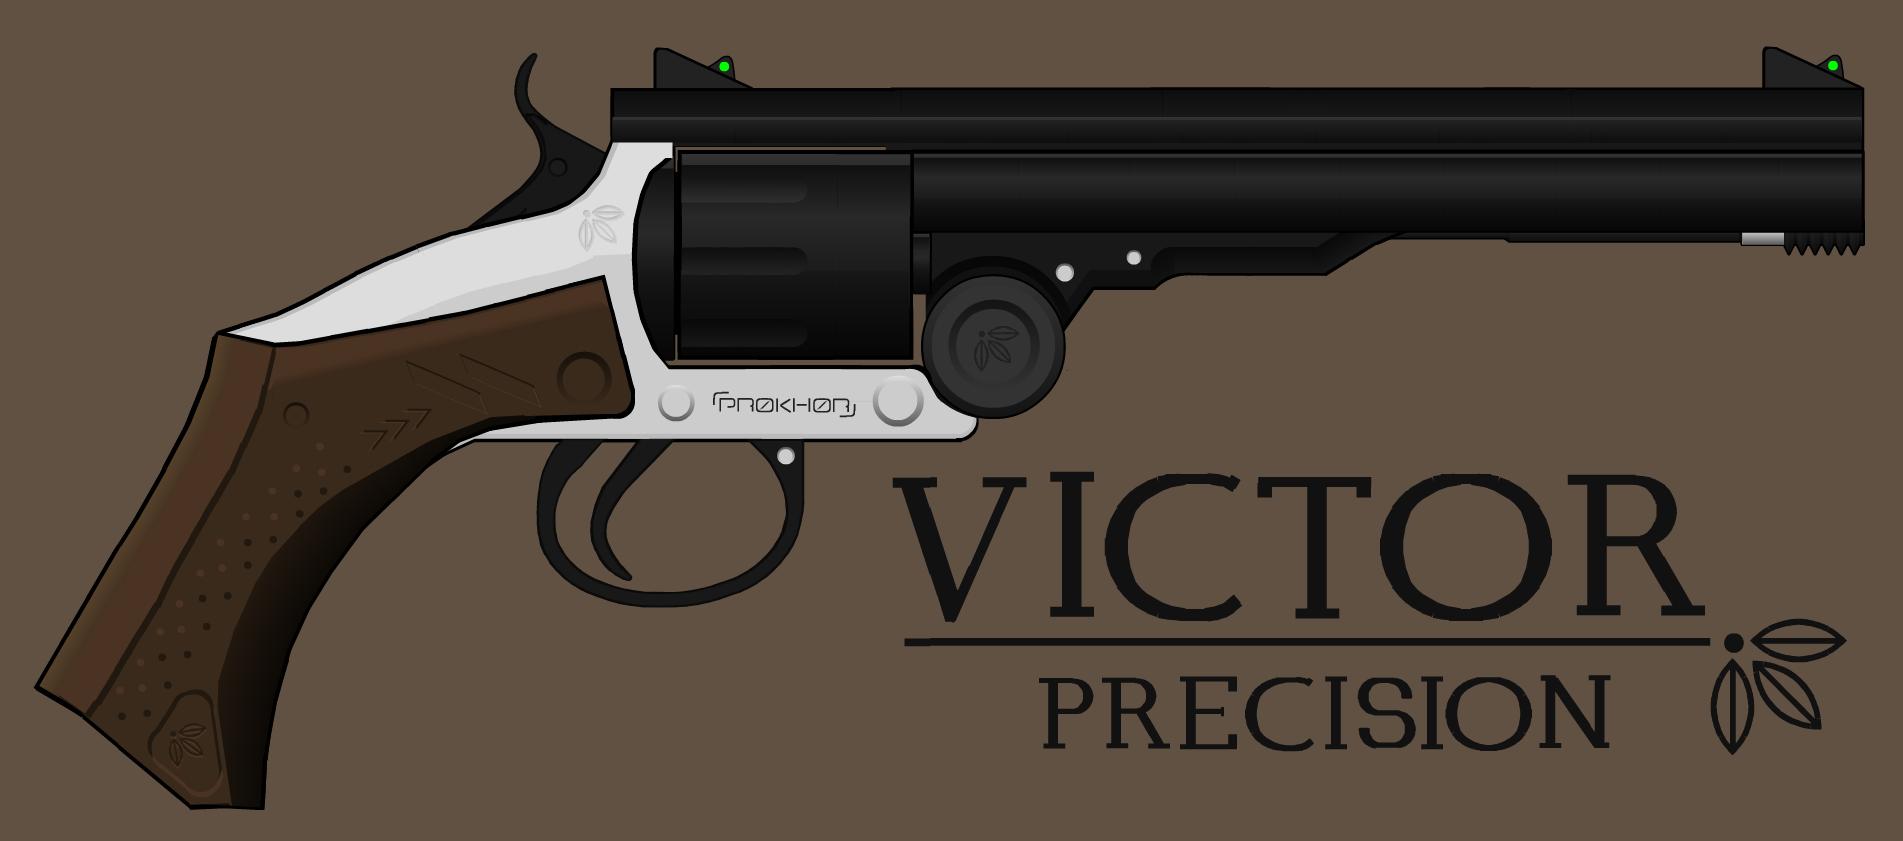 Victor Precison - Kaban Long Revolver by prokhorvlg